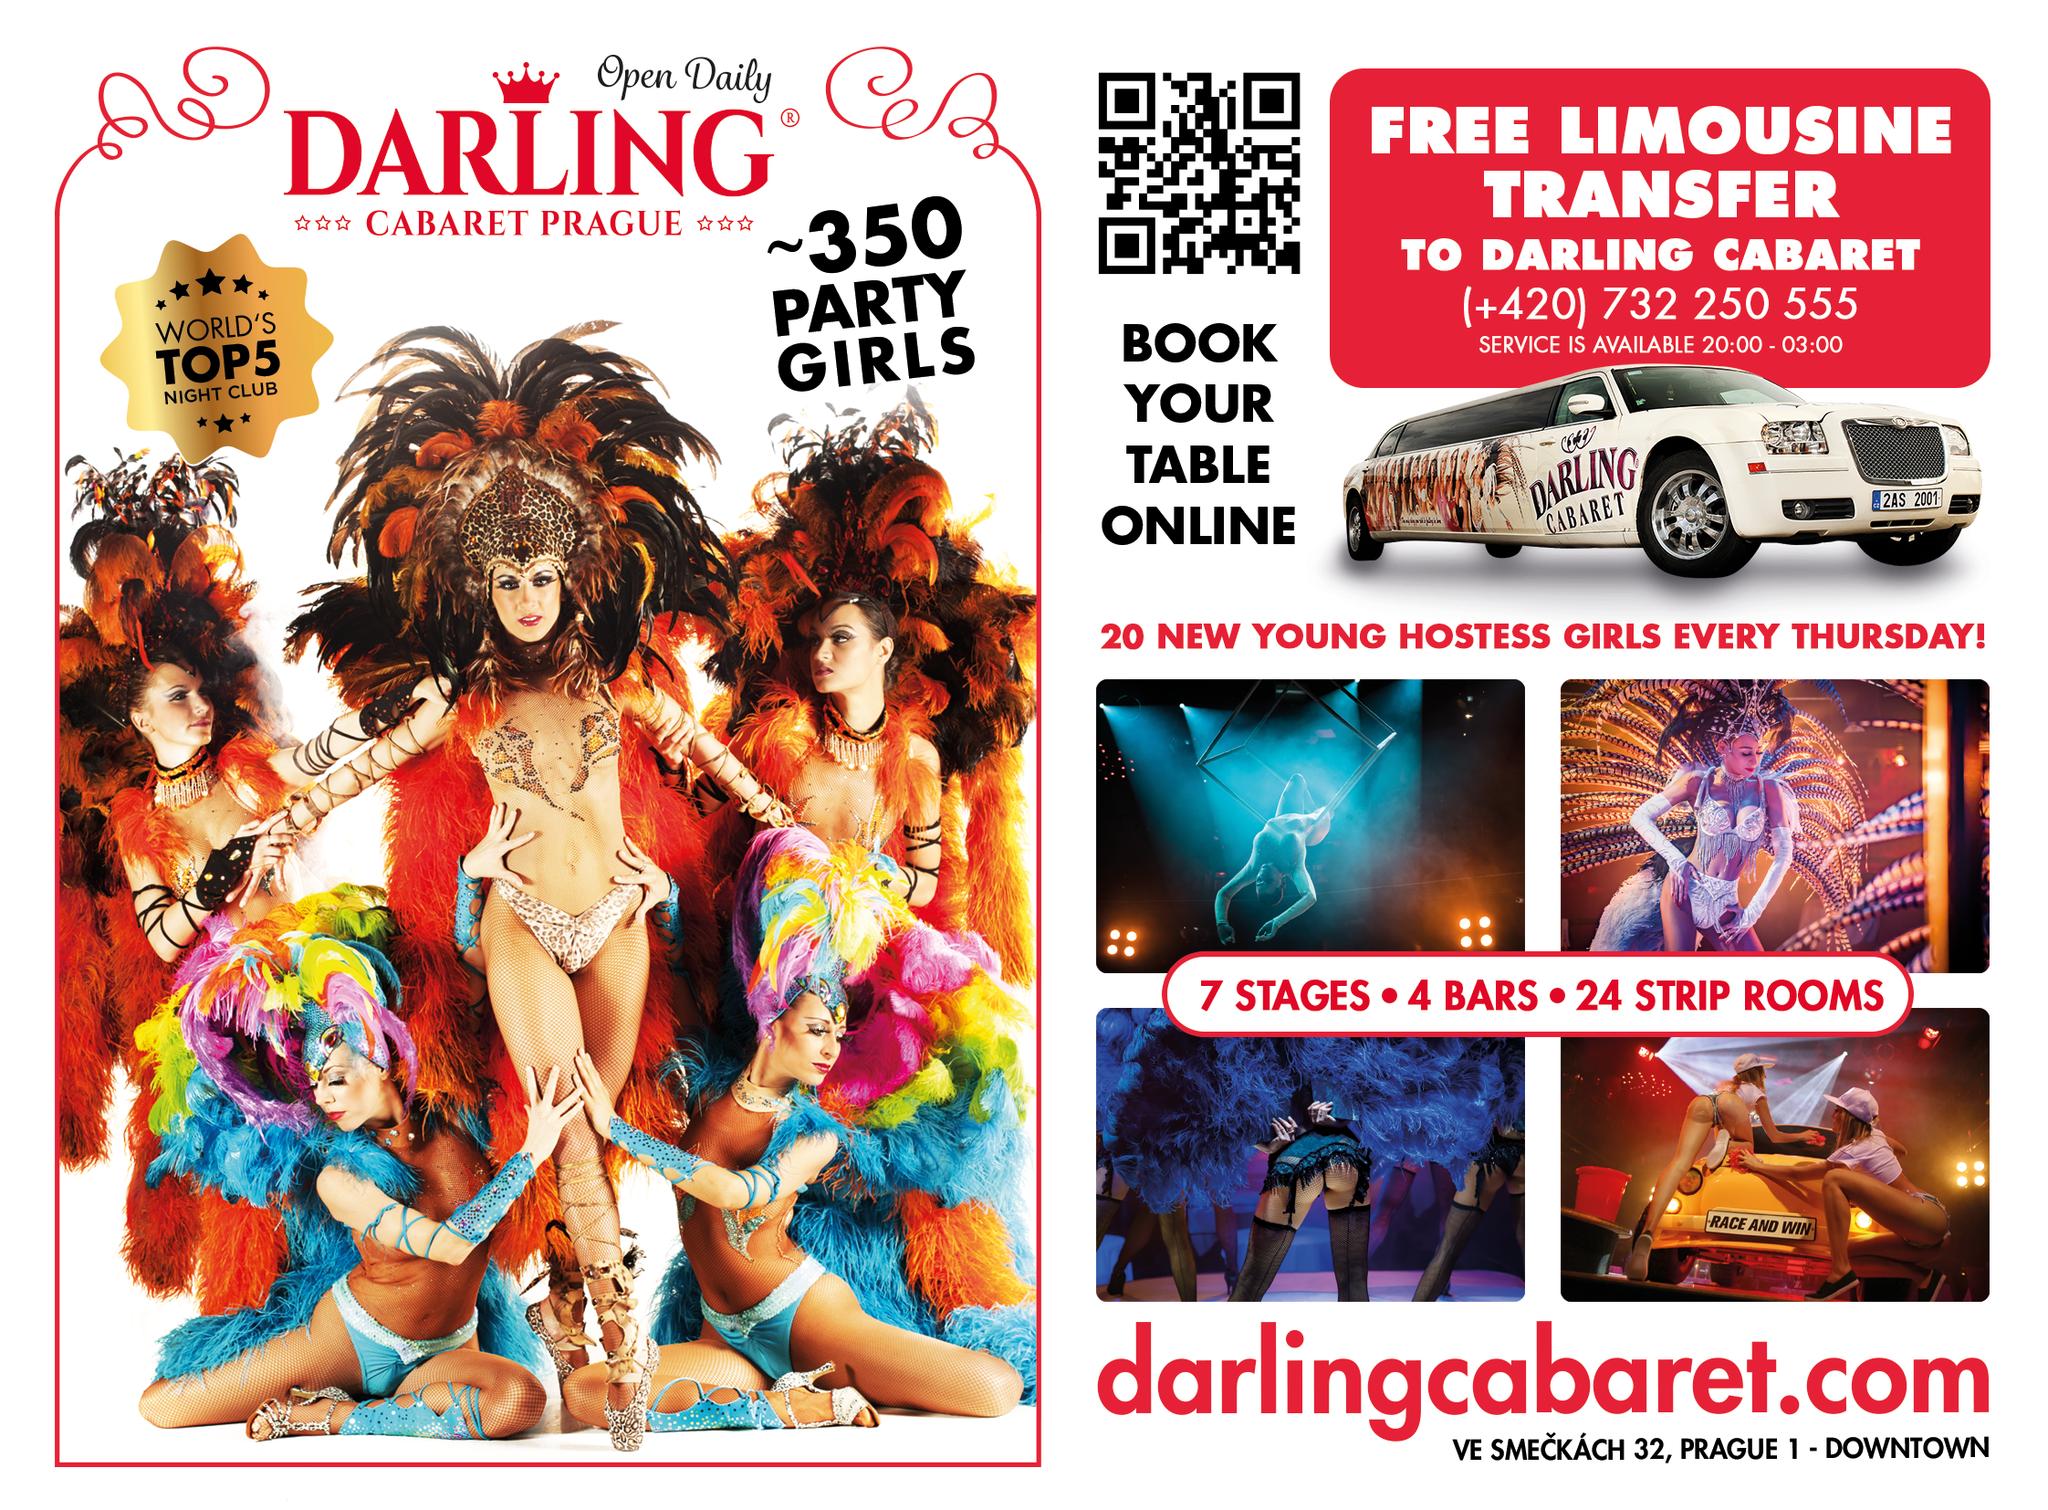 Darling-novy-inzerat